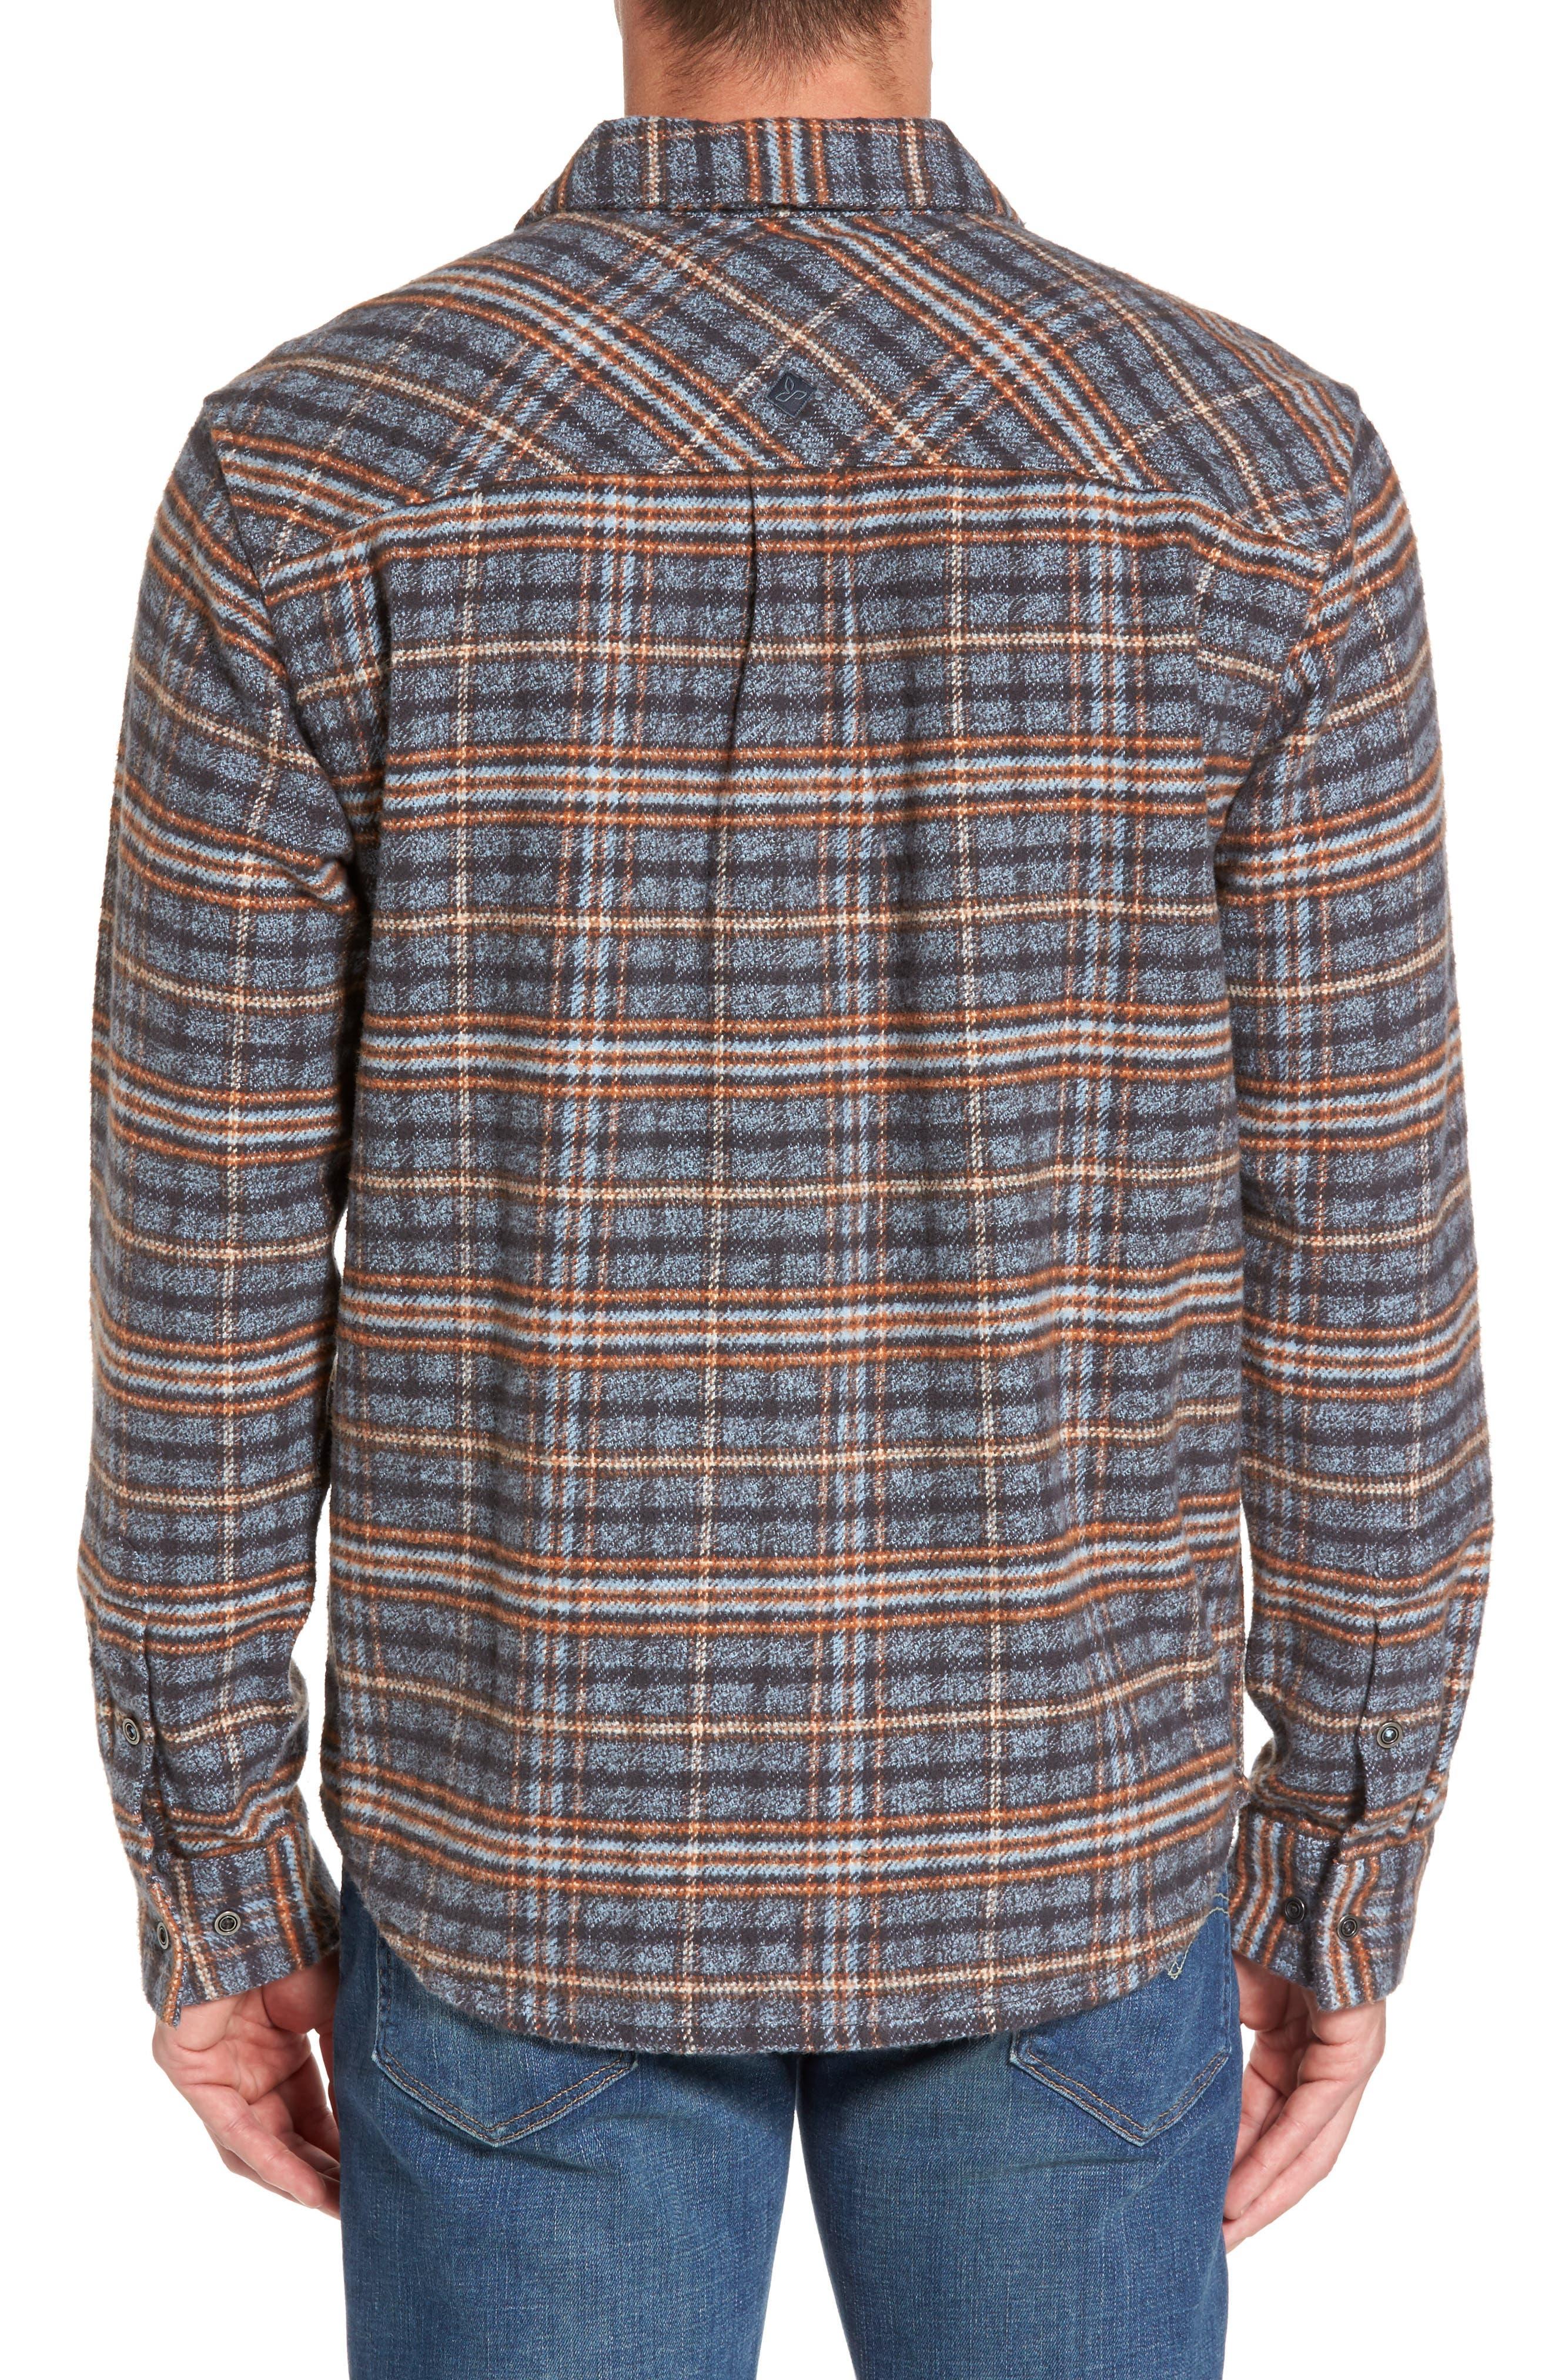 Brayden Regular Fit Plaid Flannel Shirt,                             Alternate thumbnail 3, color,